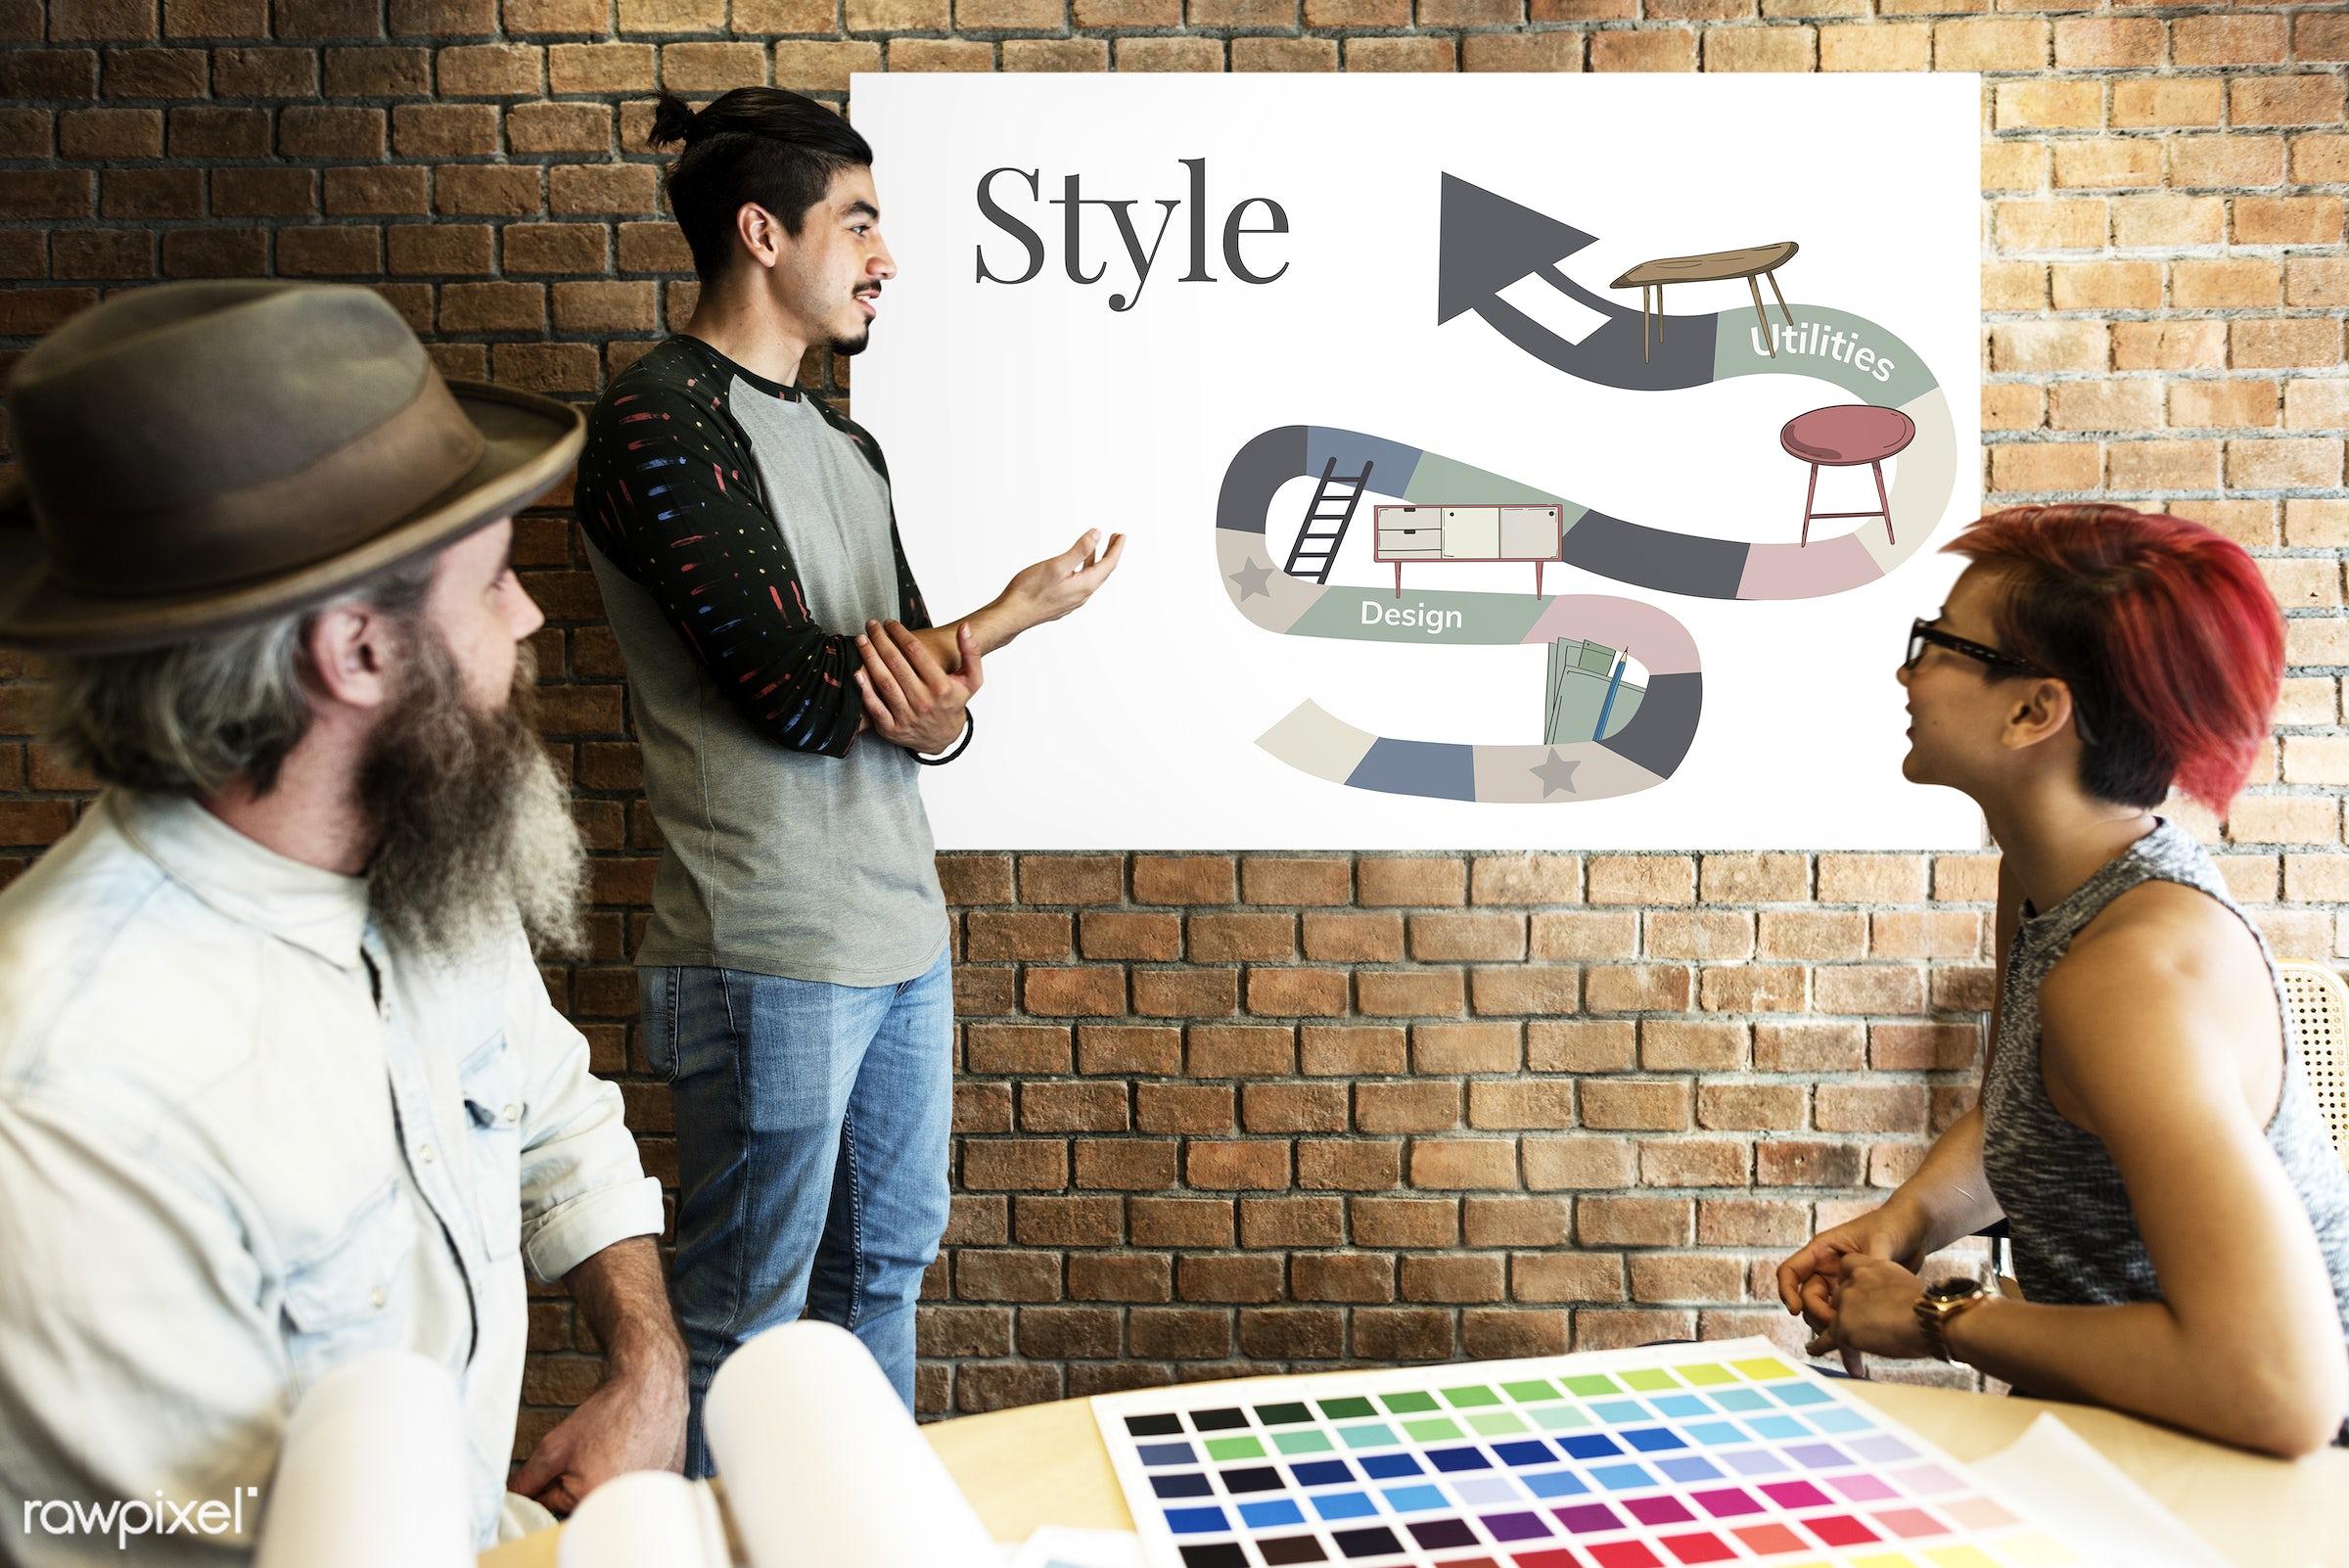 appliances, architecture, art, beard, board, brick wall, chart, color chart, colors, concept, creative, creativity, decor,...